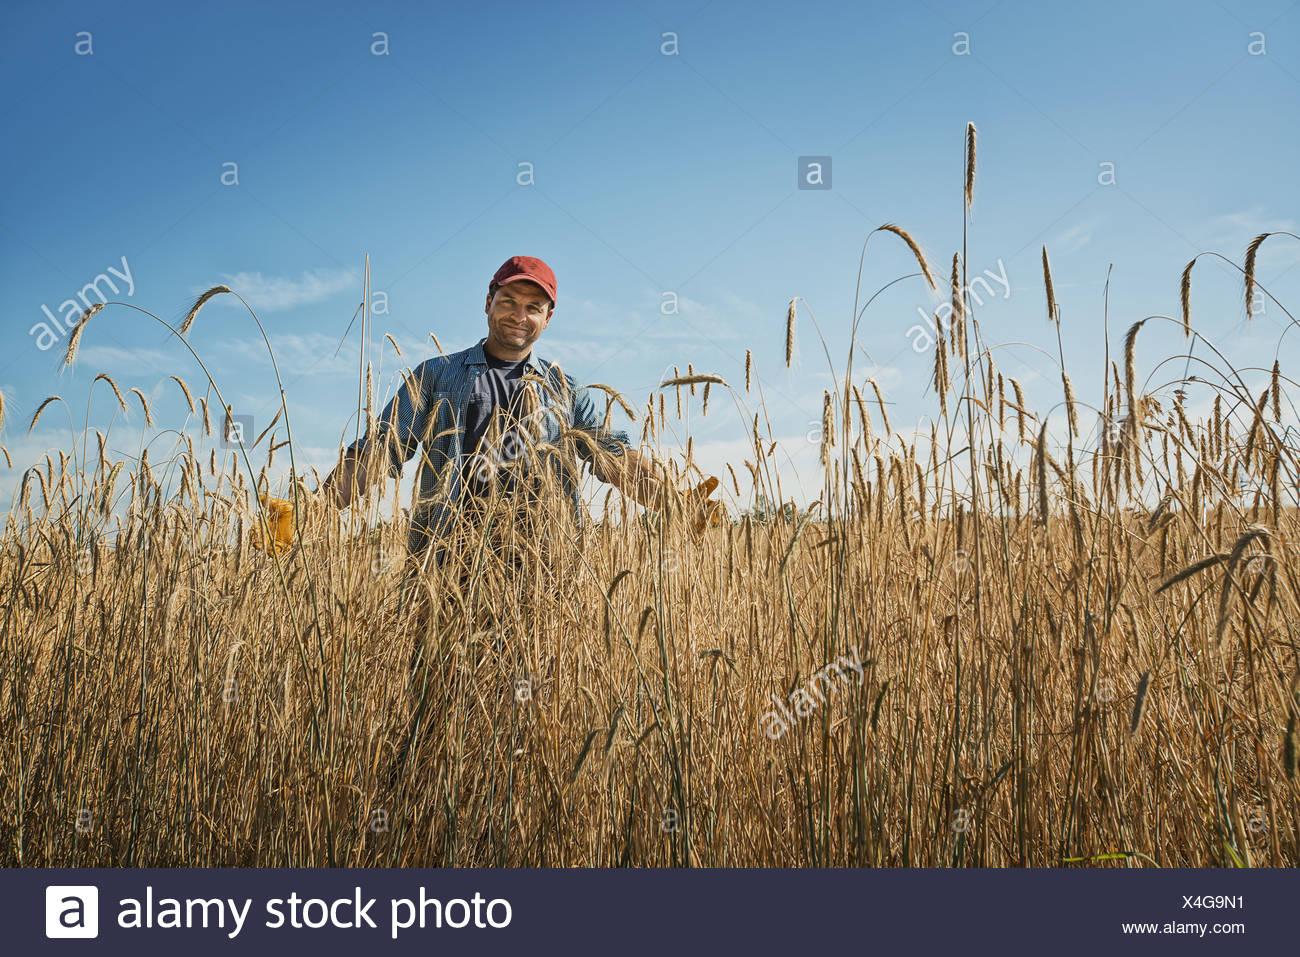 New York state USA man in field tall ripening wheat corn stalks crop - Stock Image